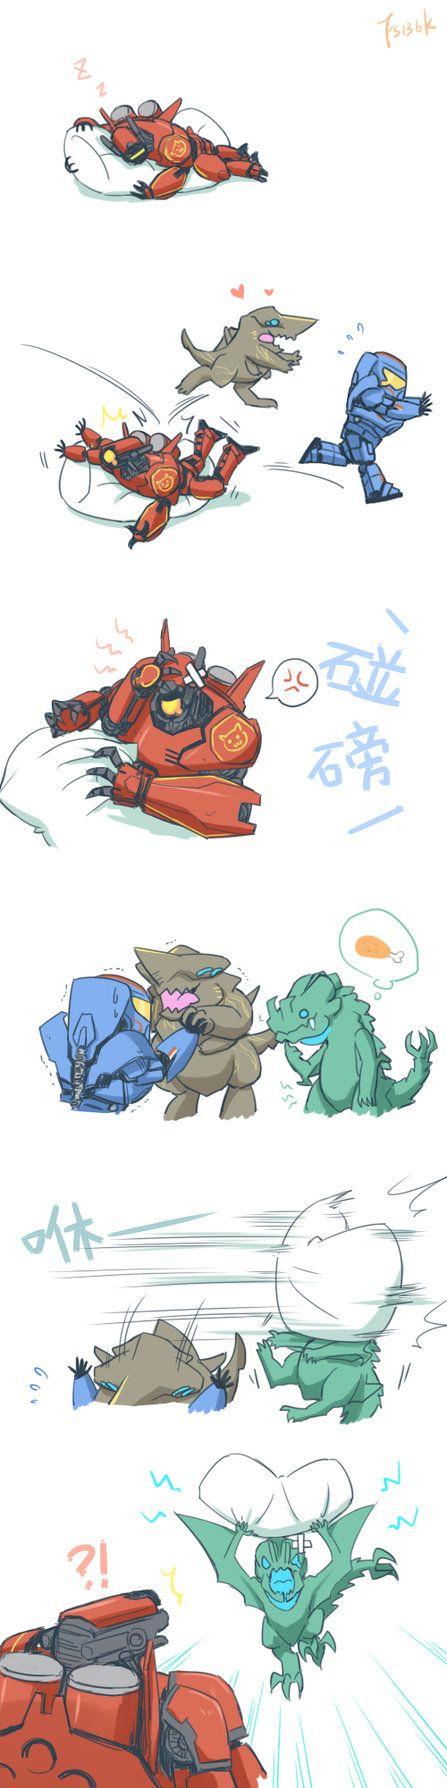 Cute Jaegers.